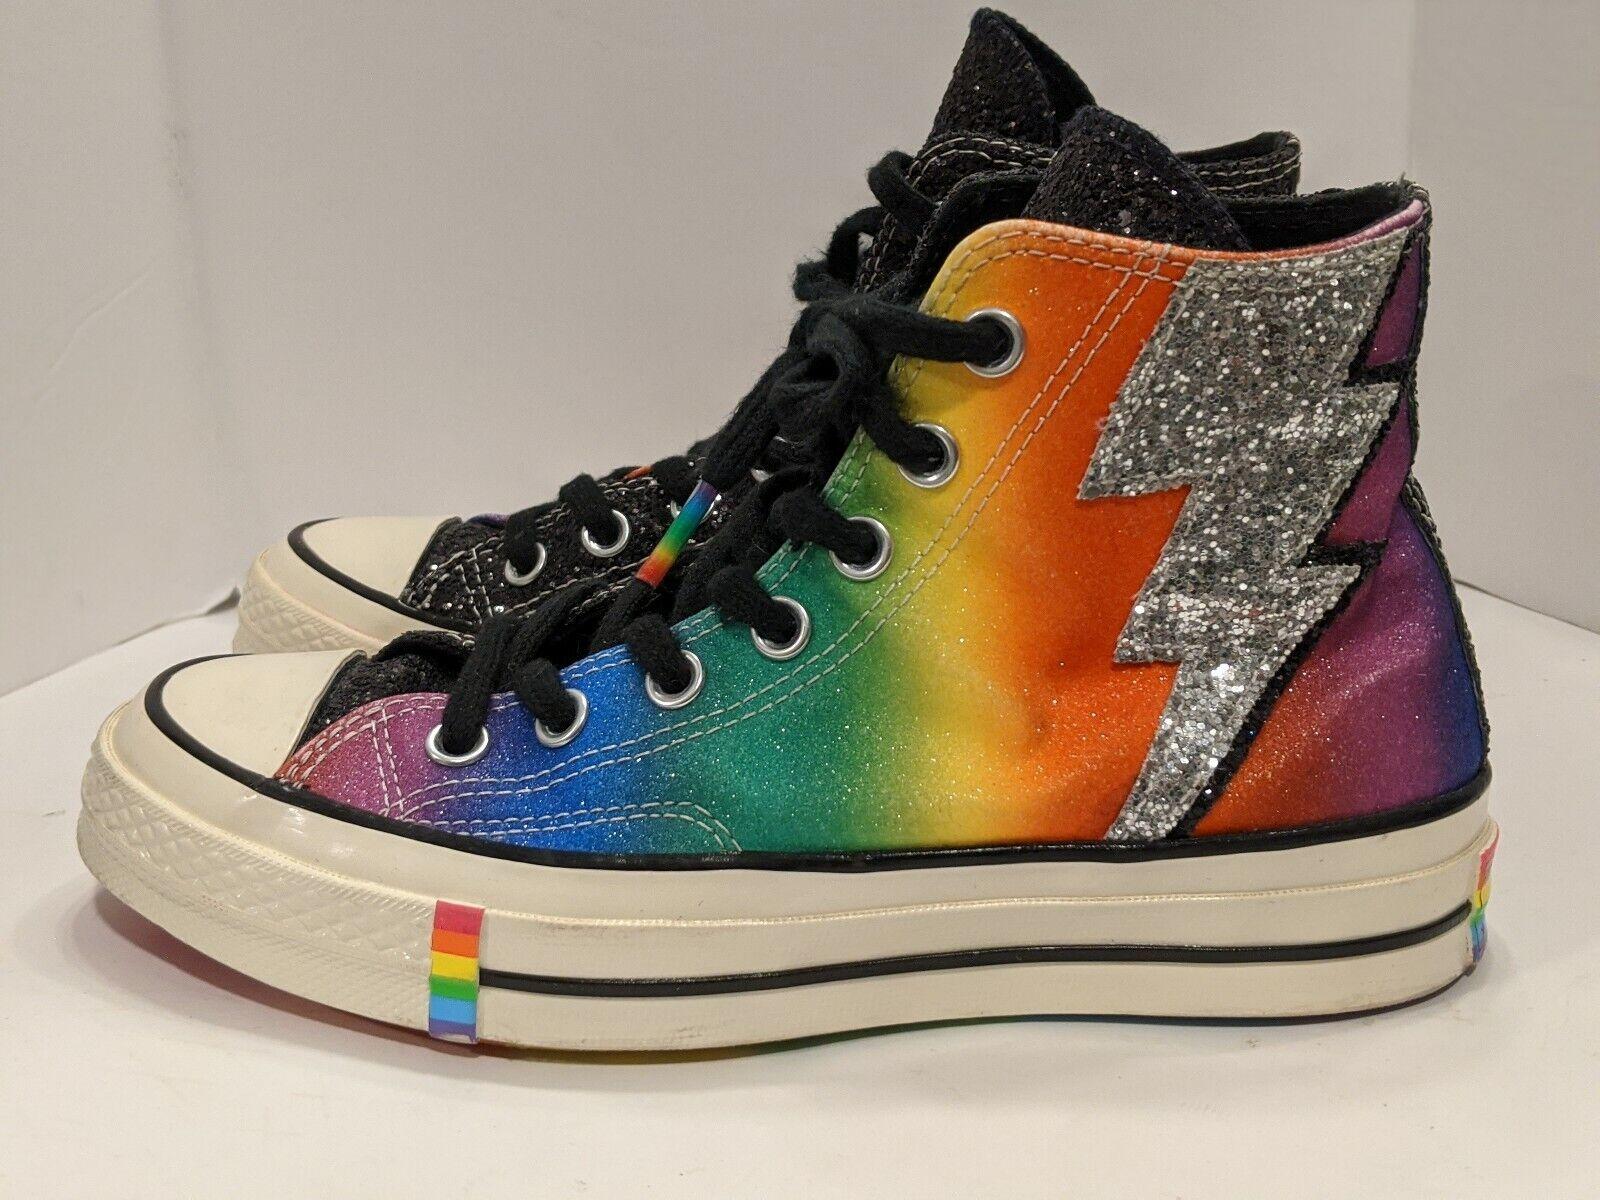 Converse Chuck Taylor All Star 70 Hi Rainbow Pride Lightning Bolt LGBTQ+ Glitter